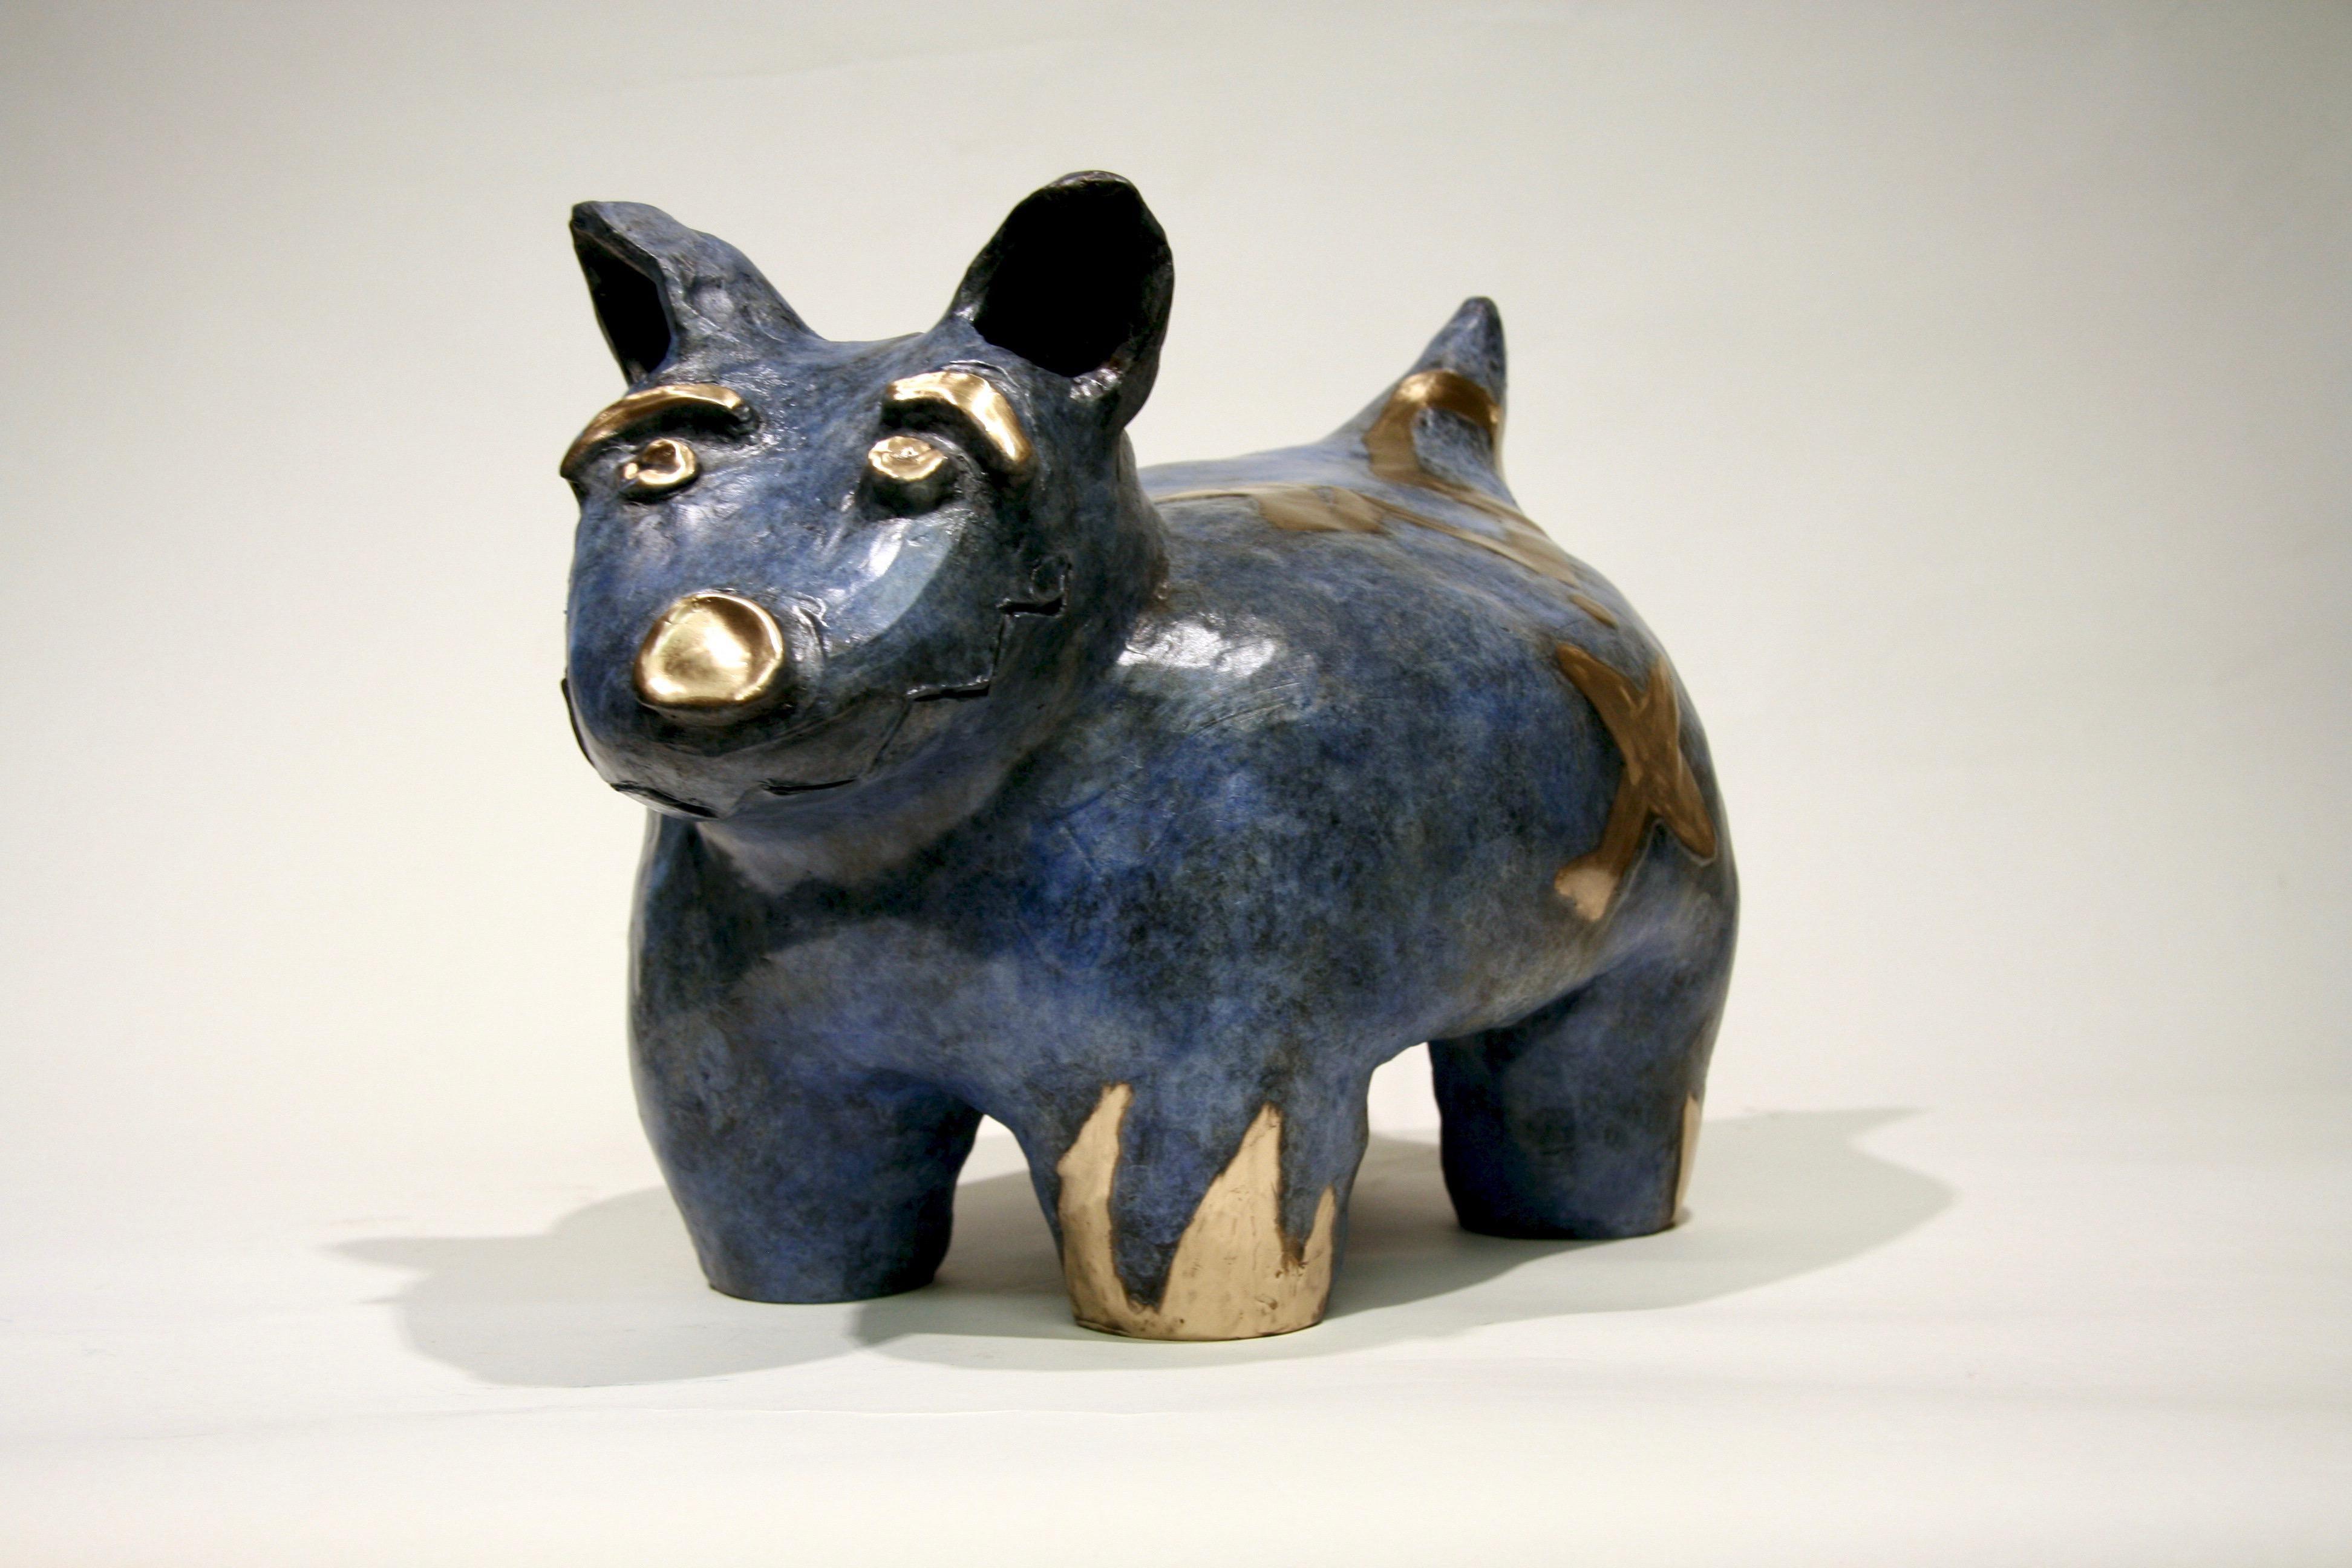 Fred W. Begaye Gives Tours of His Homeland, bronze dog sculpture, Navajo, blue